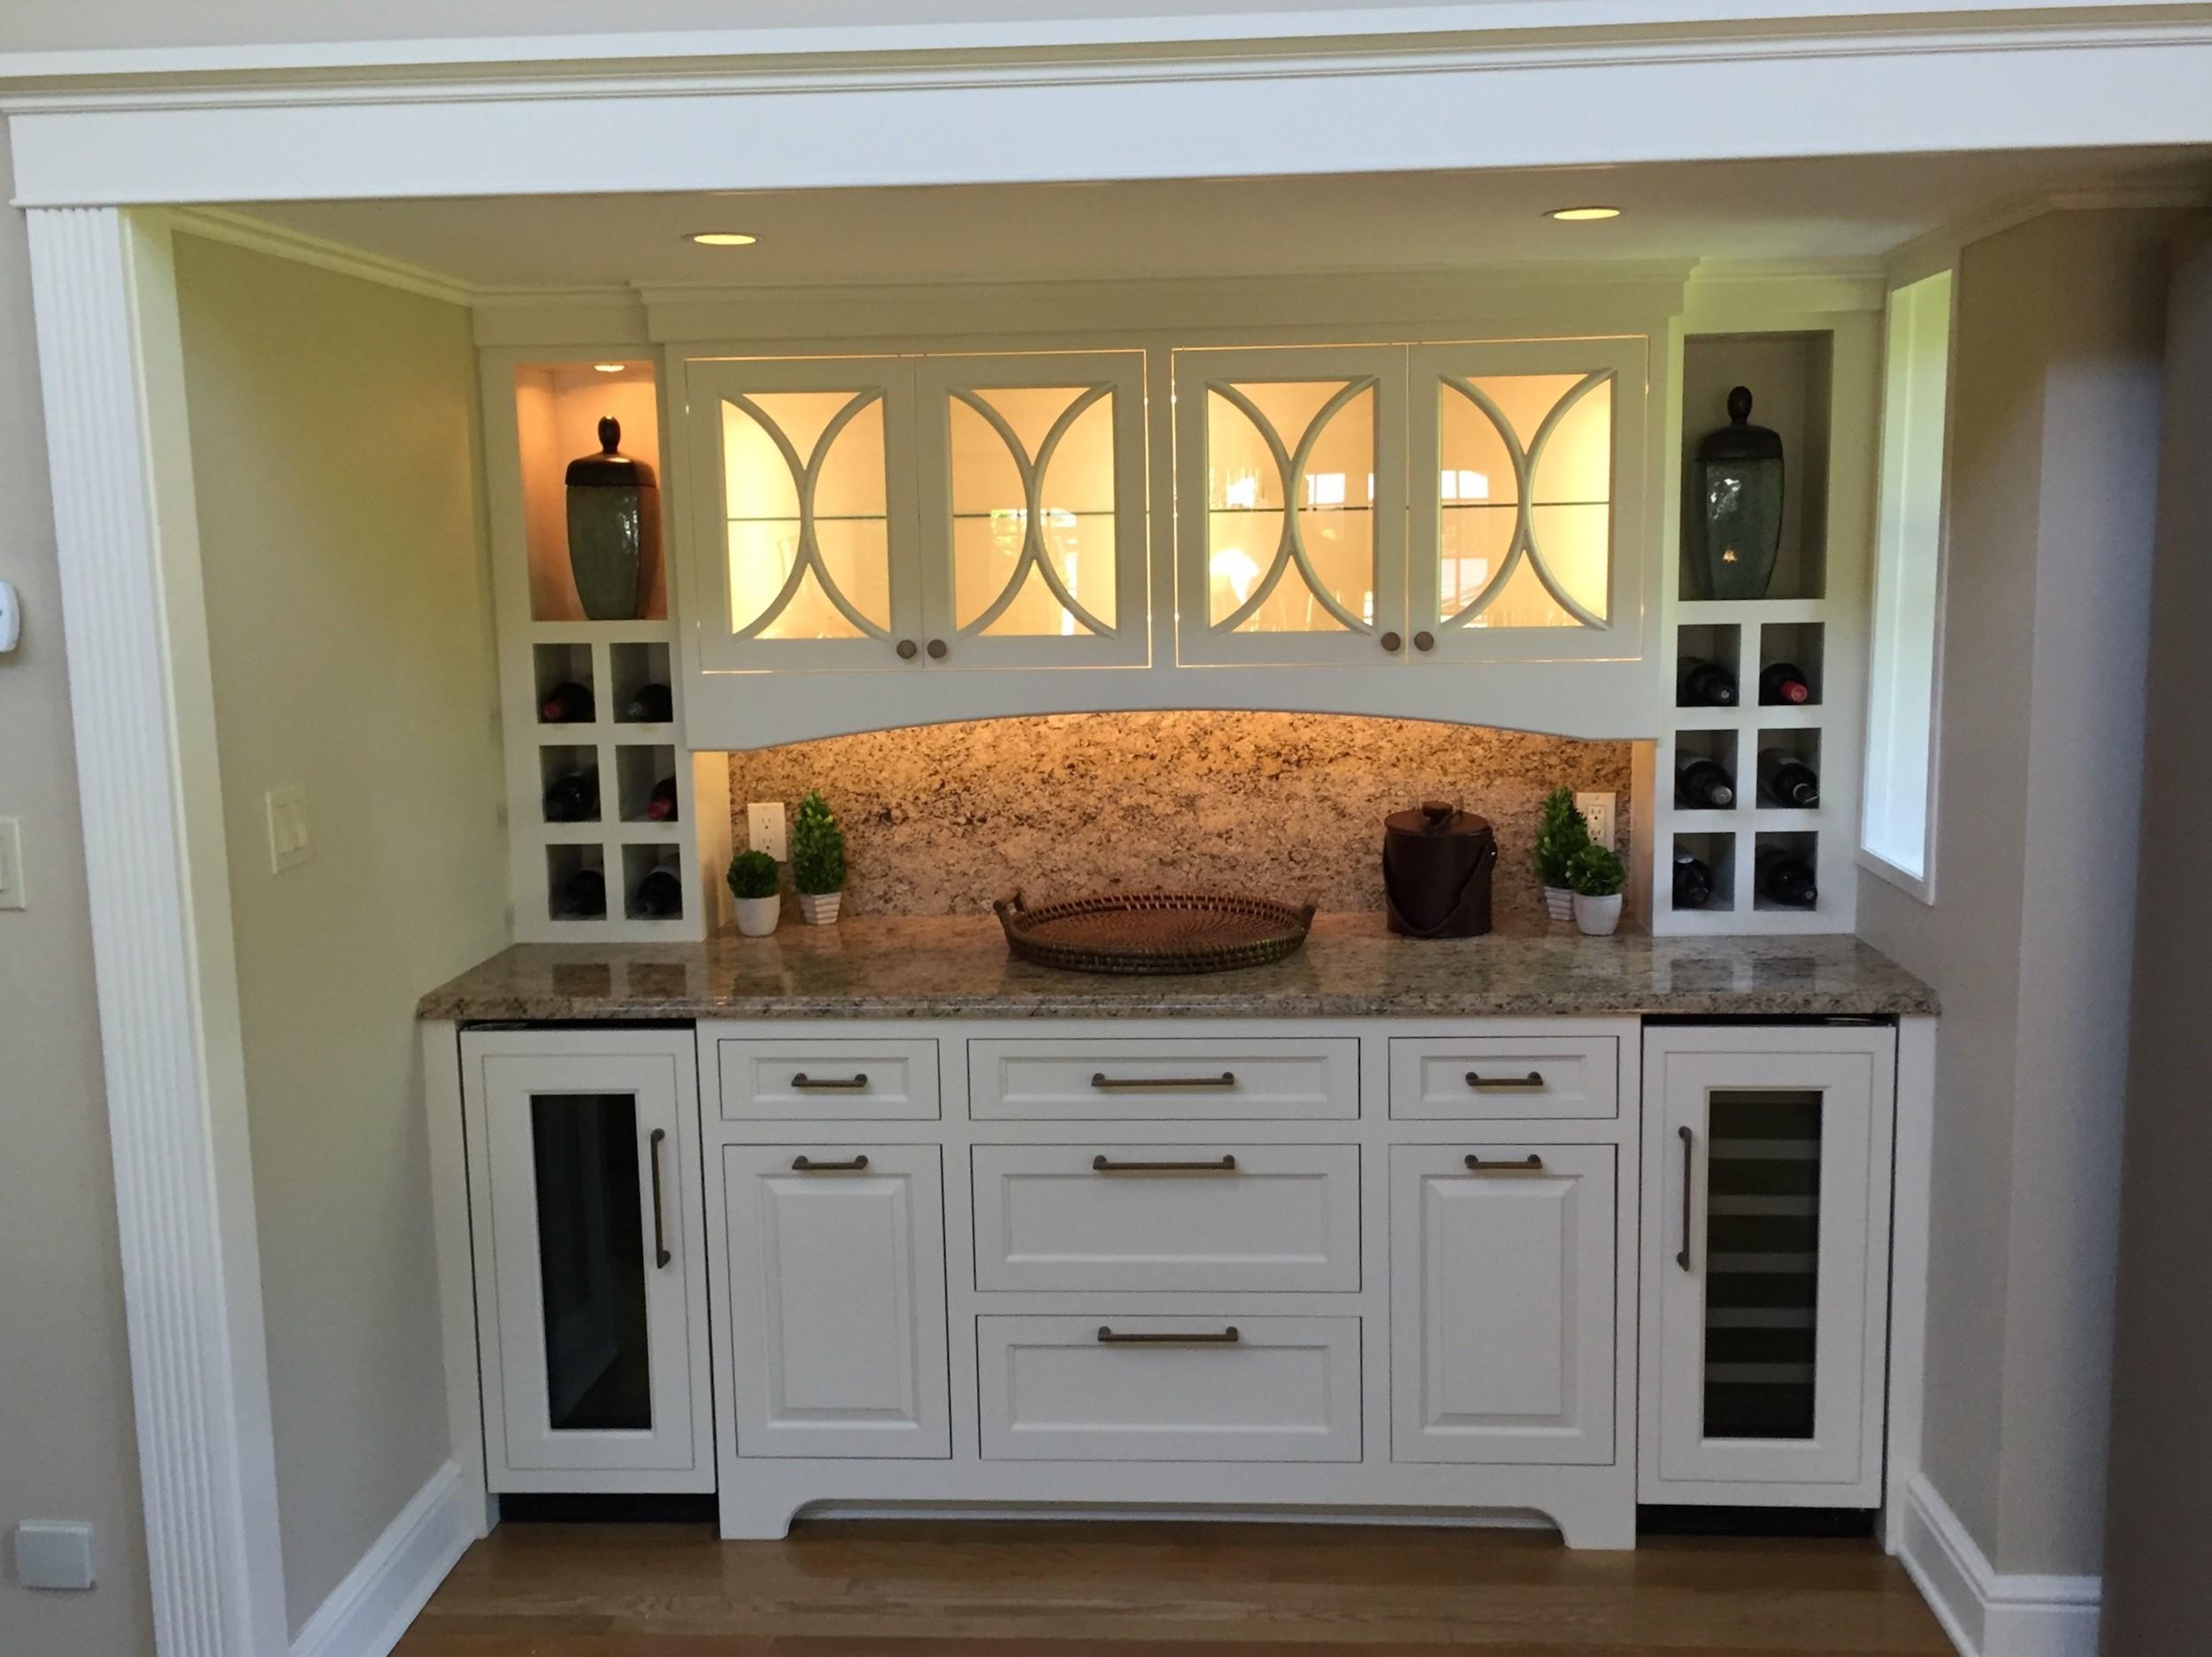 7-KitchenVisions-Built-in-Bar-Belmont.jpg